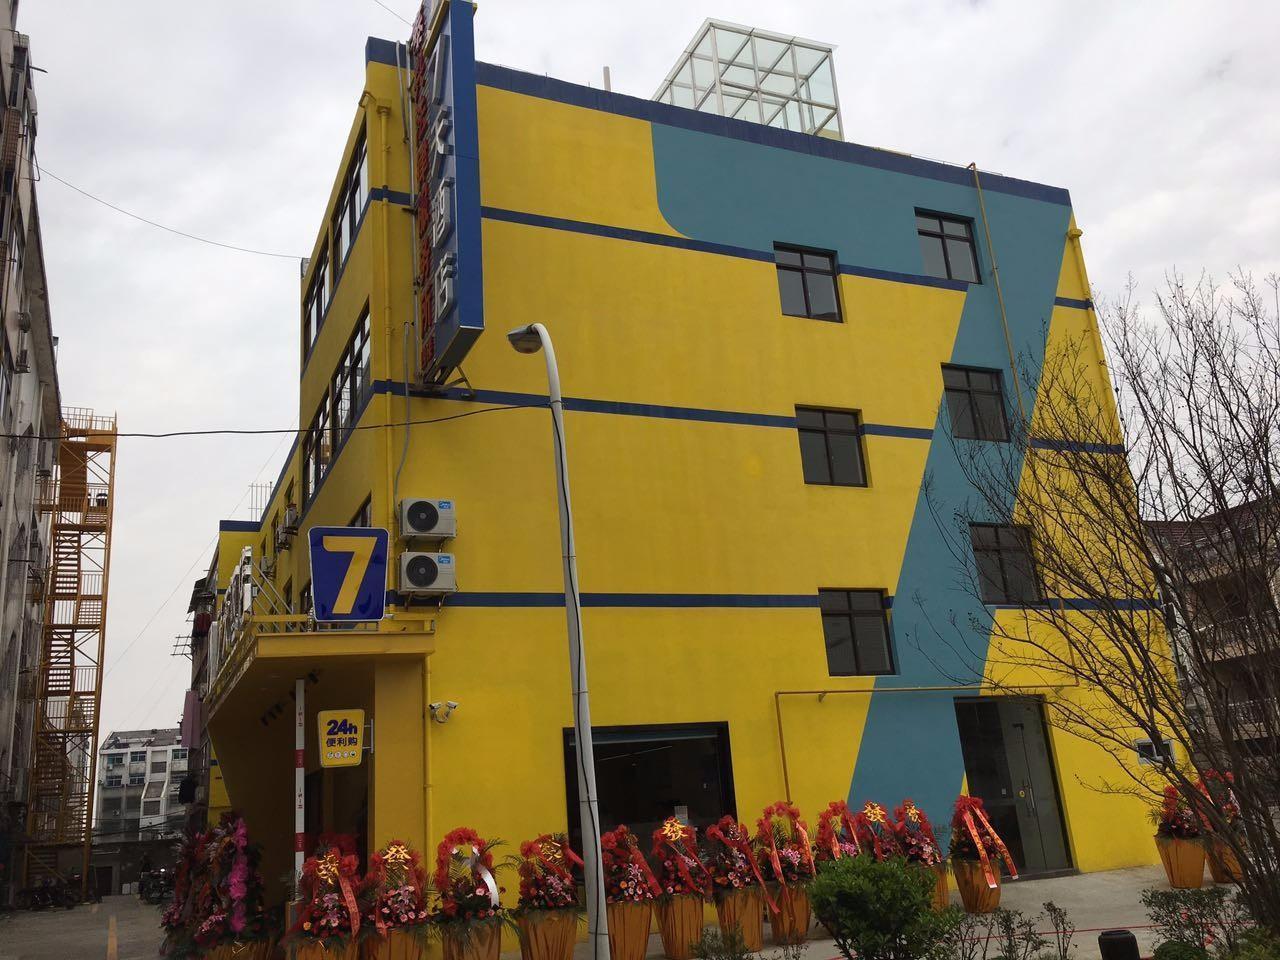 7 Days Inn�Taixing Wenchang Road